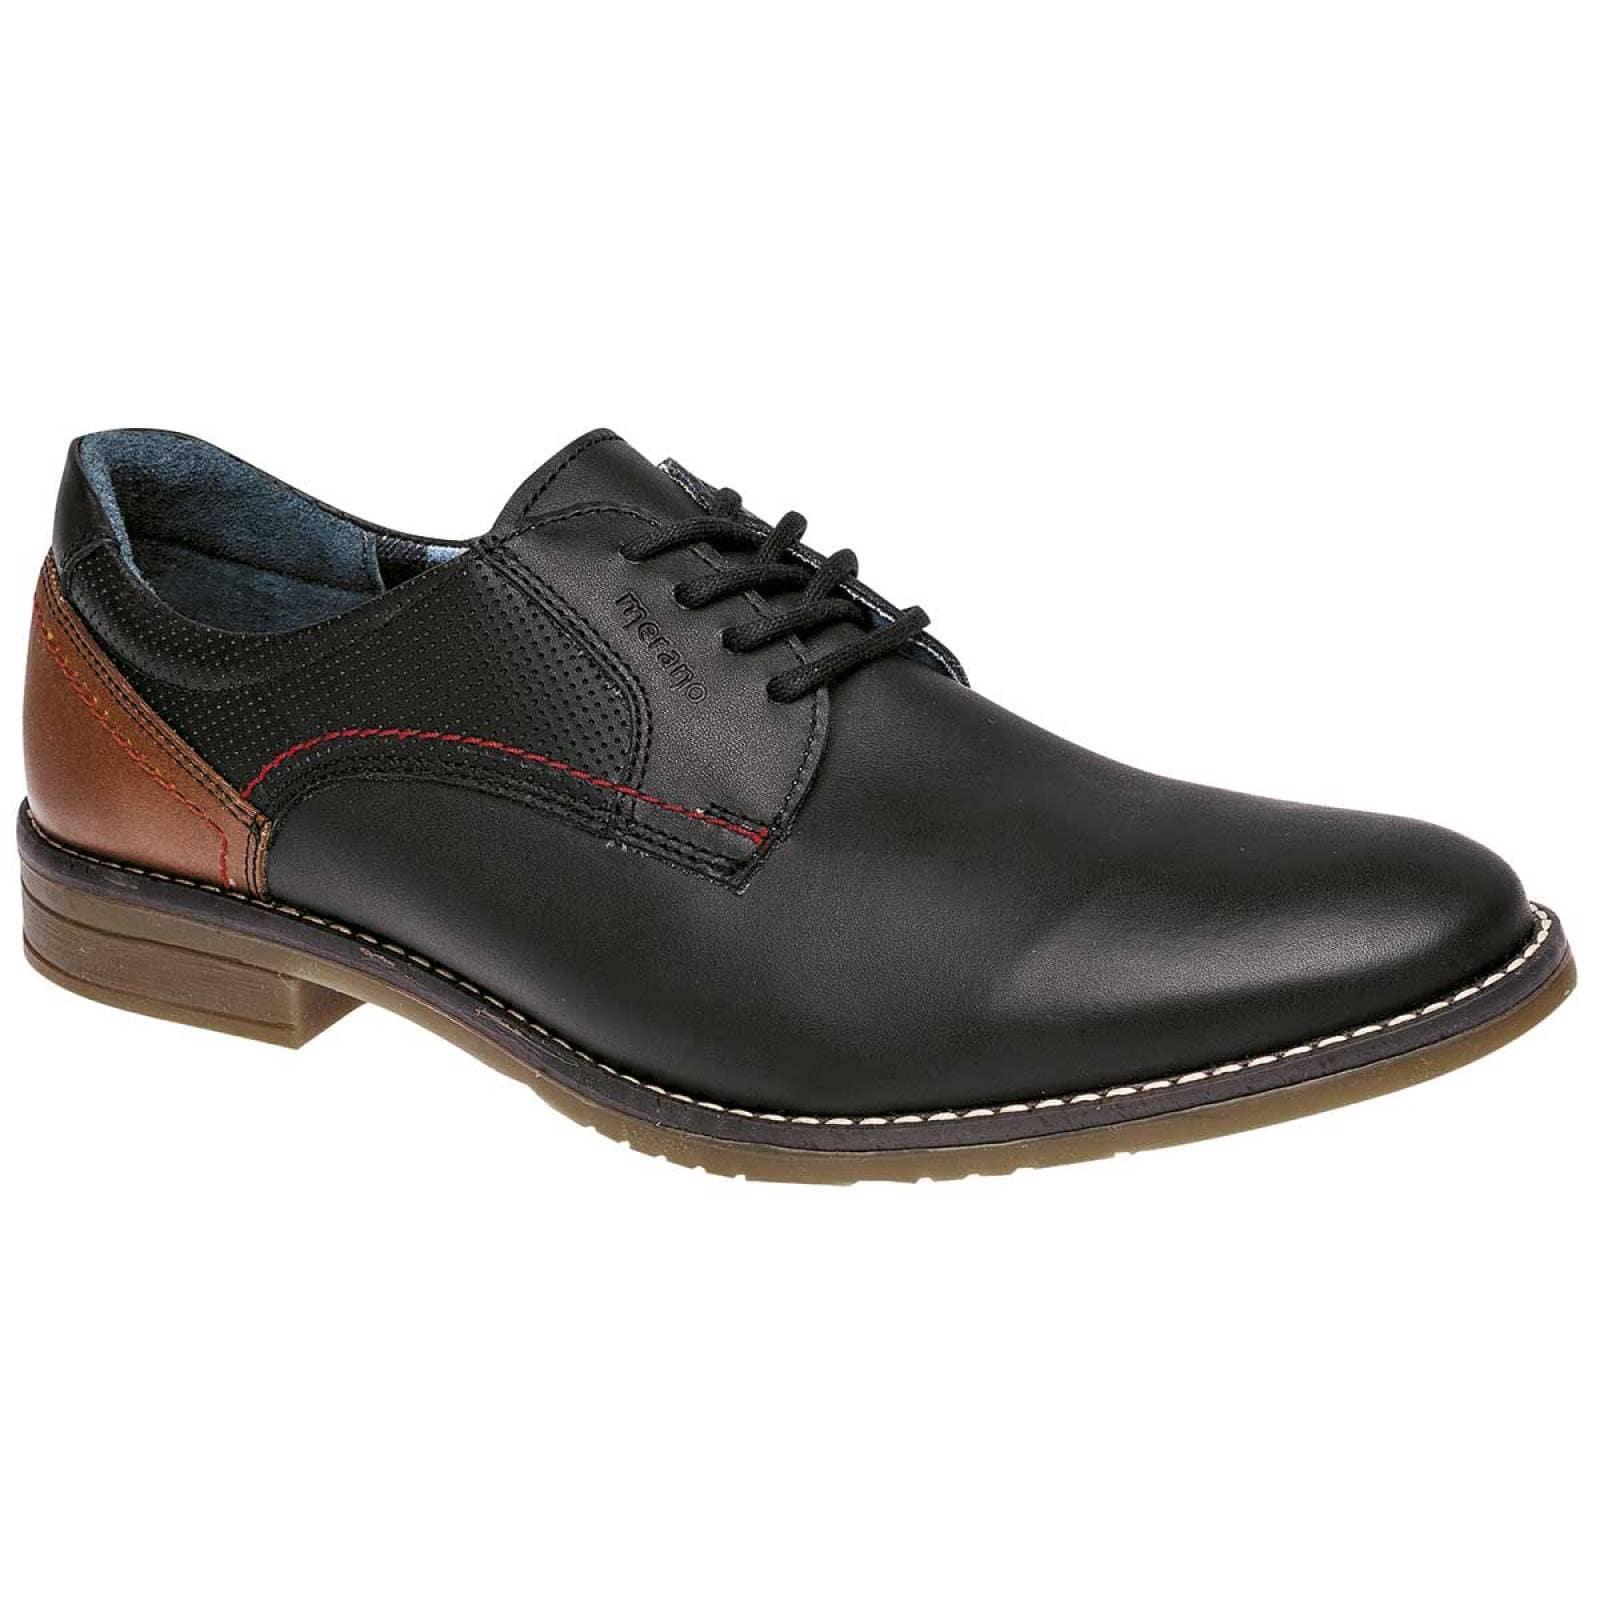 Merano Zapato Hombre Negro cafe